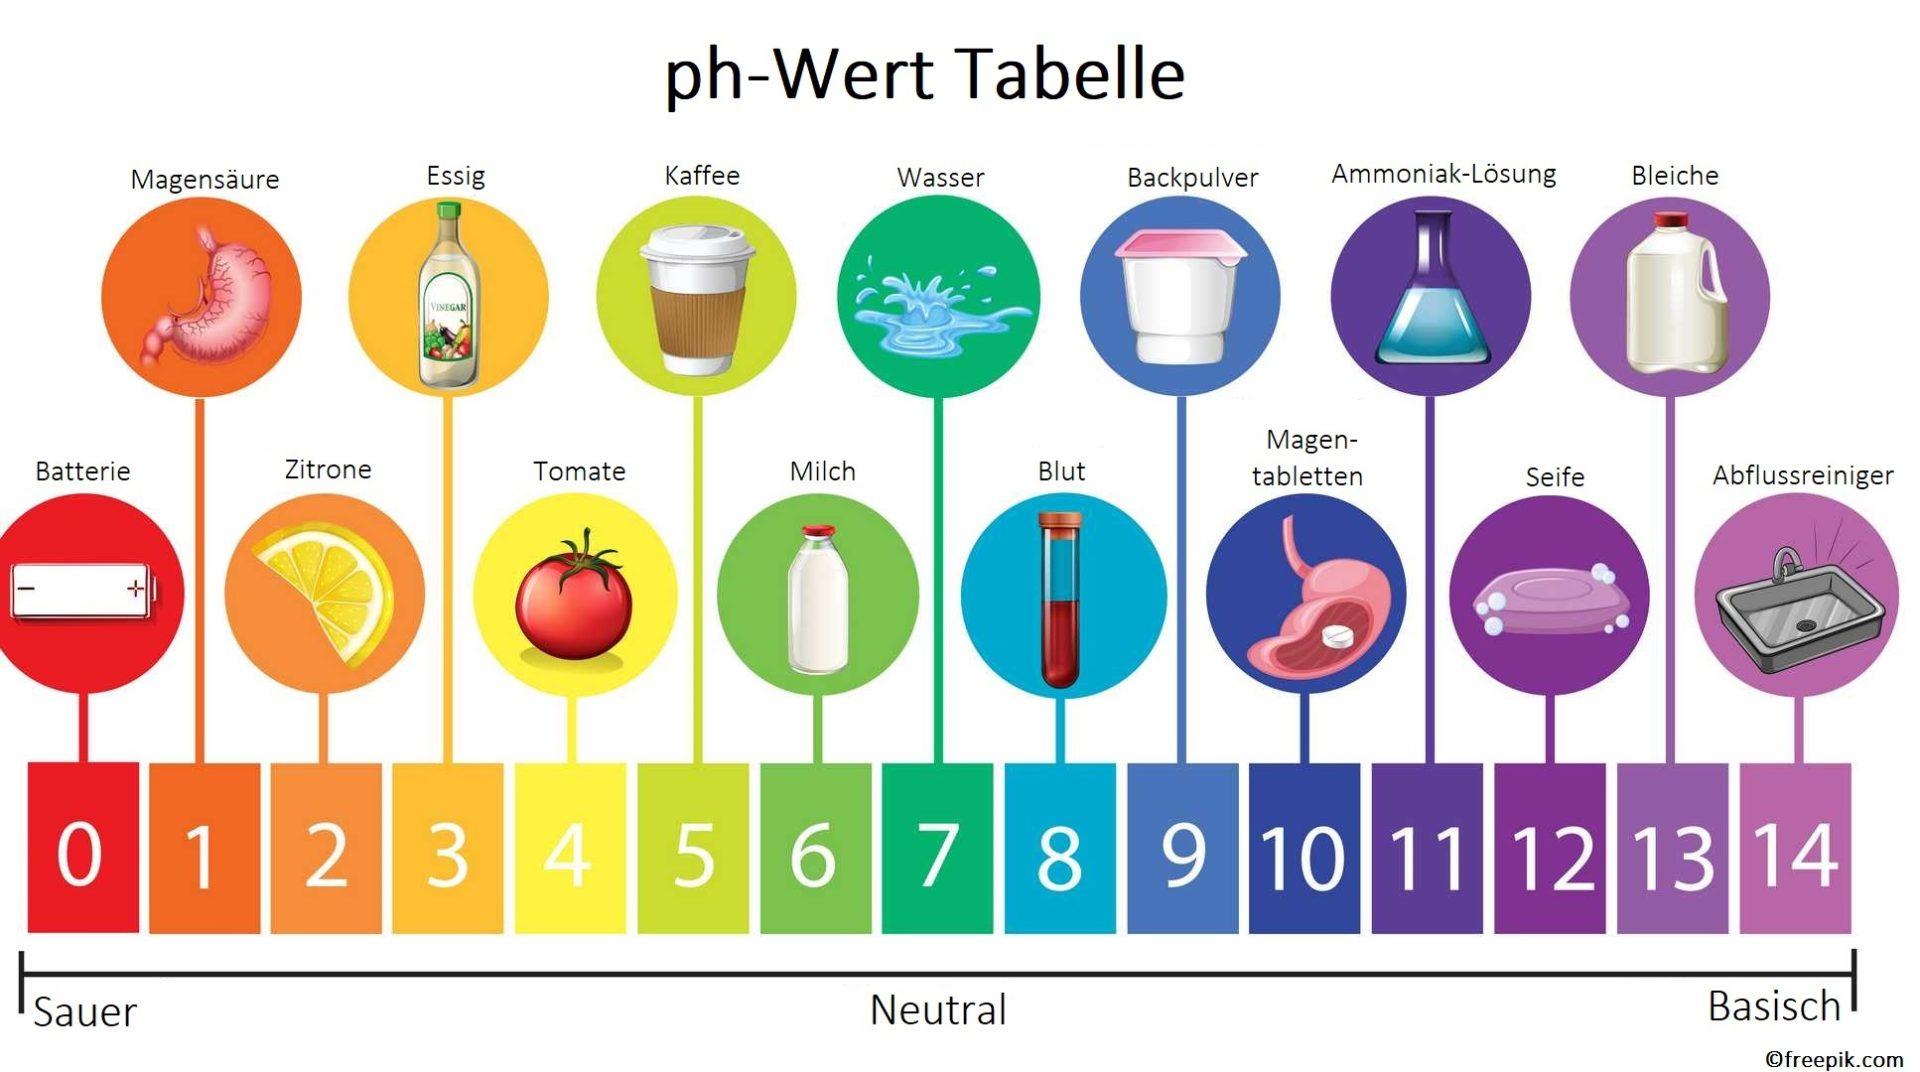 Säure-Basen-Haushalt ph-Wert Tabelle Säuren Basen